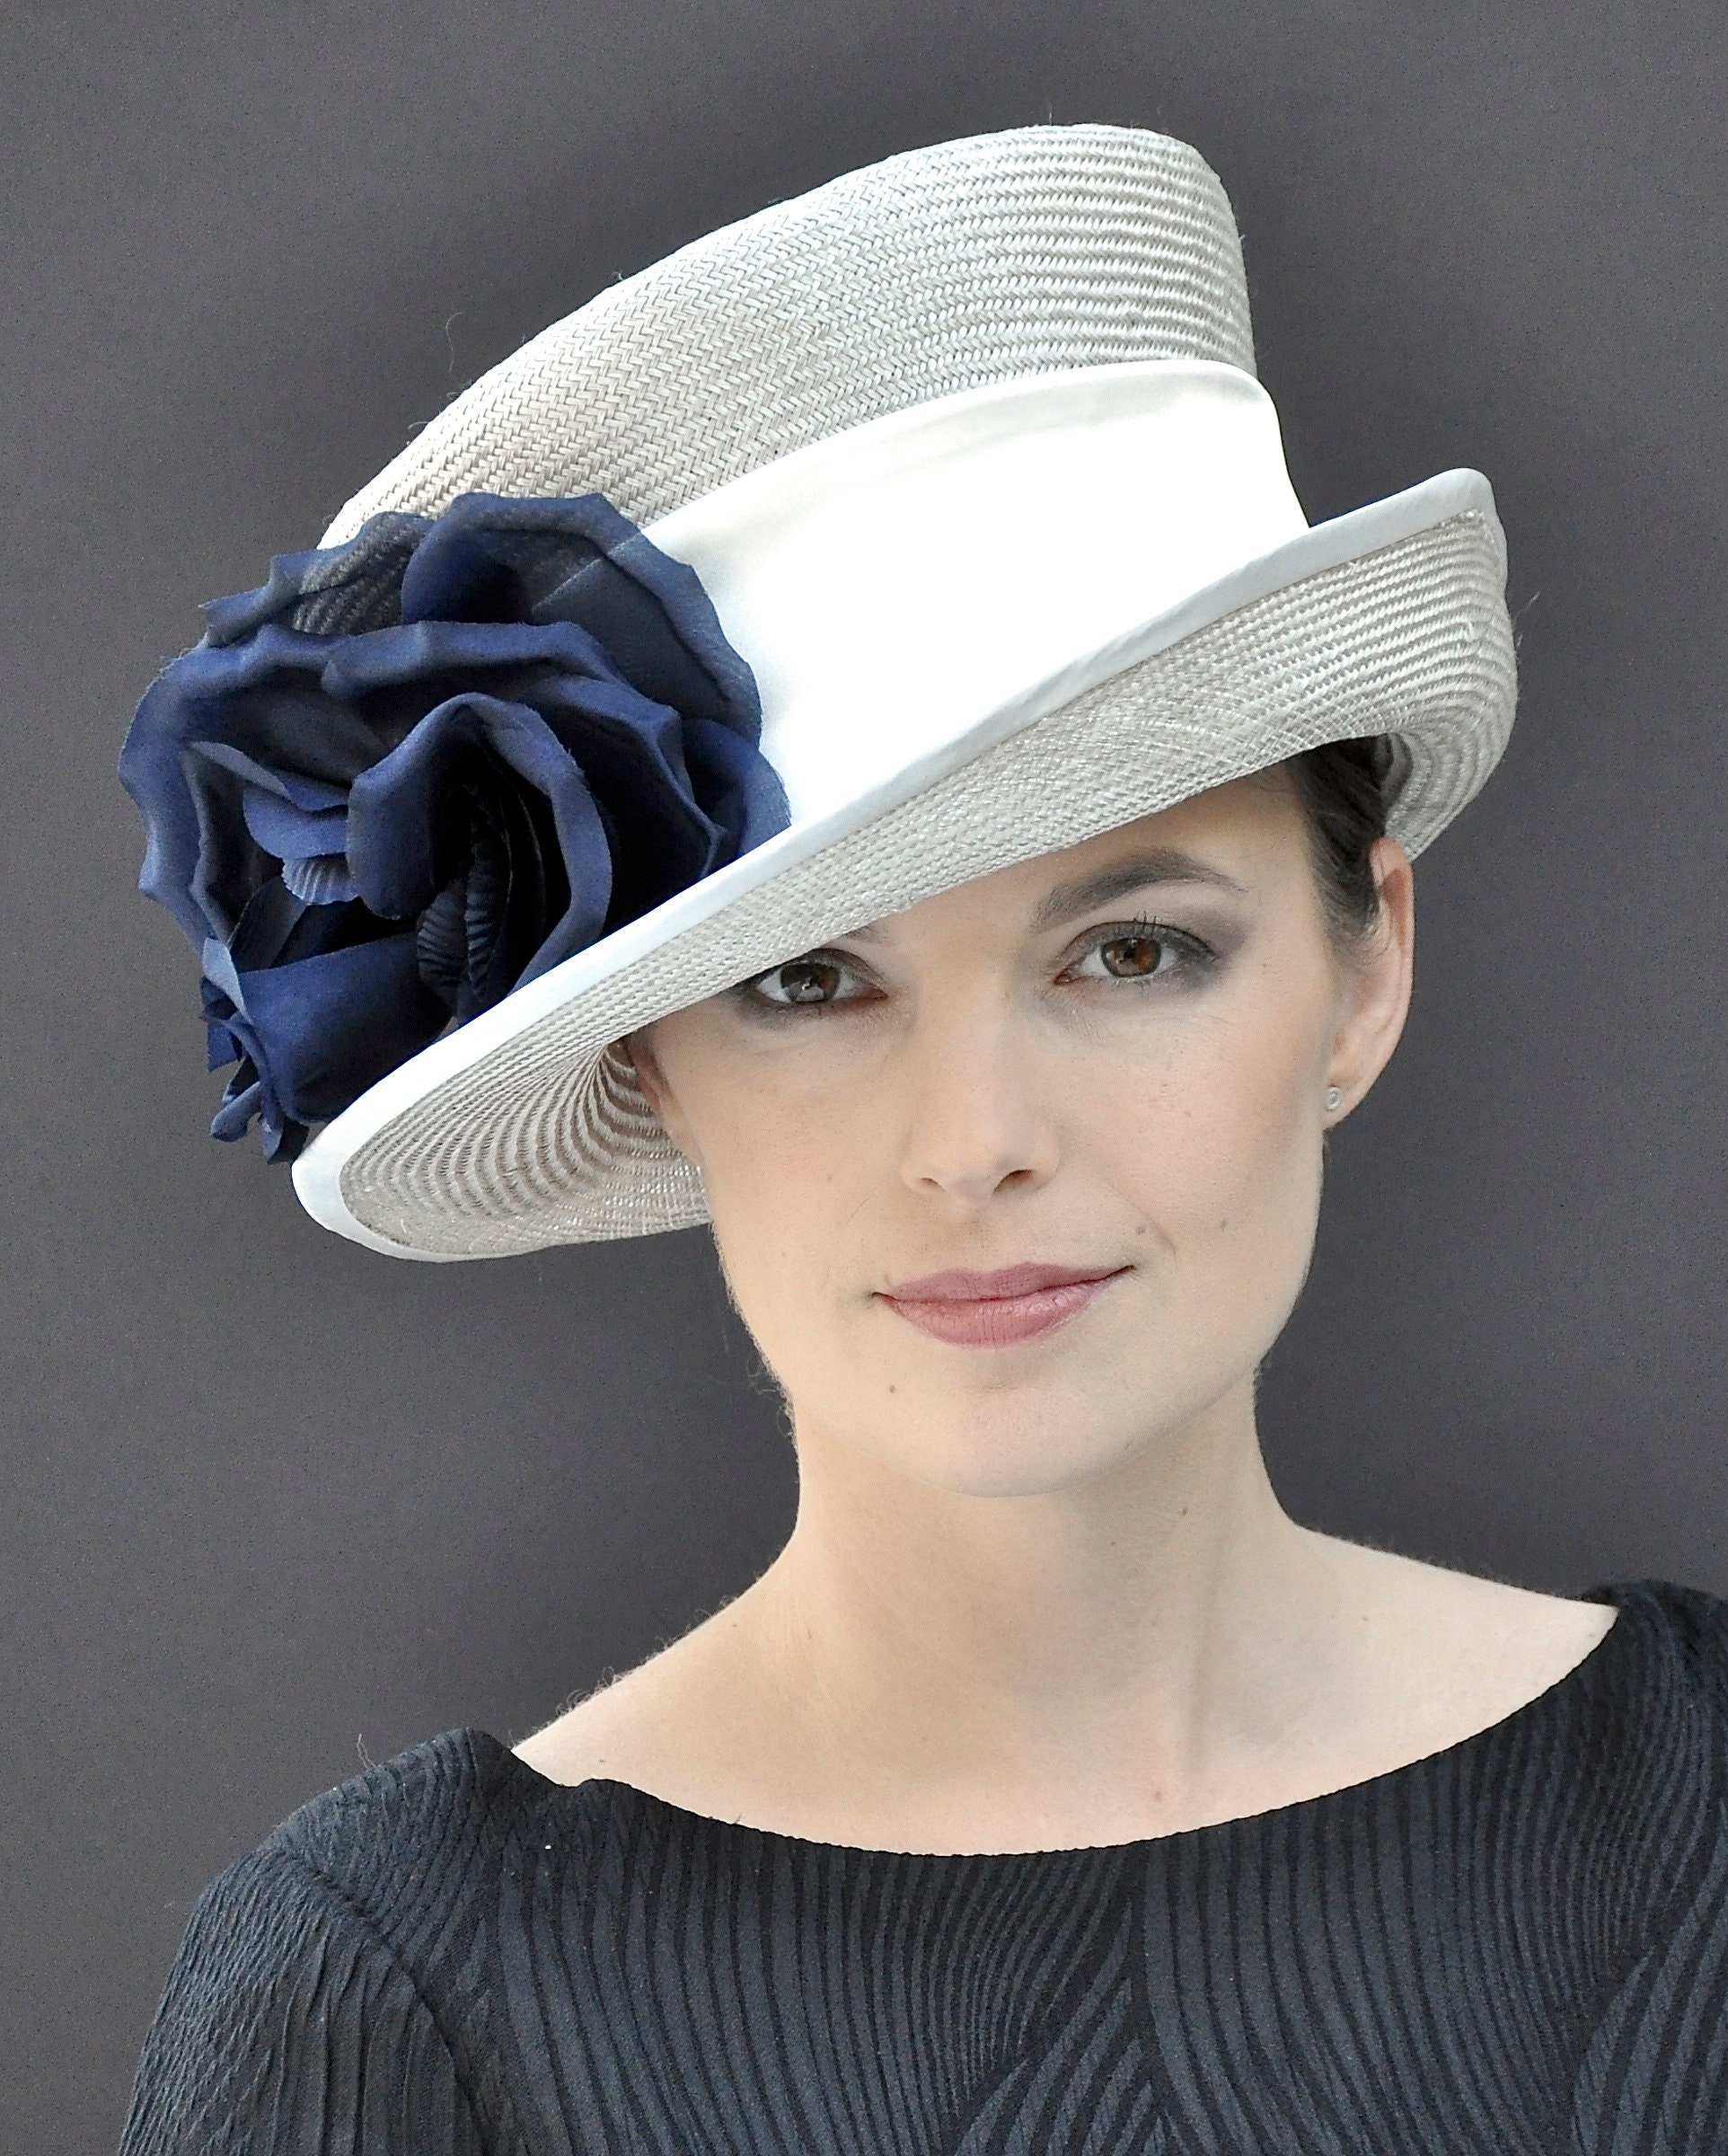 Wedding Hat, Formal Hat, Occasion Hat, Church Hat, Mother